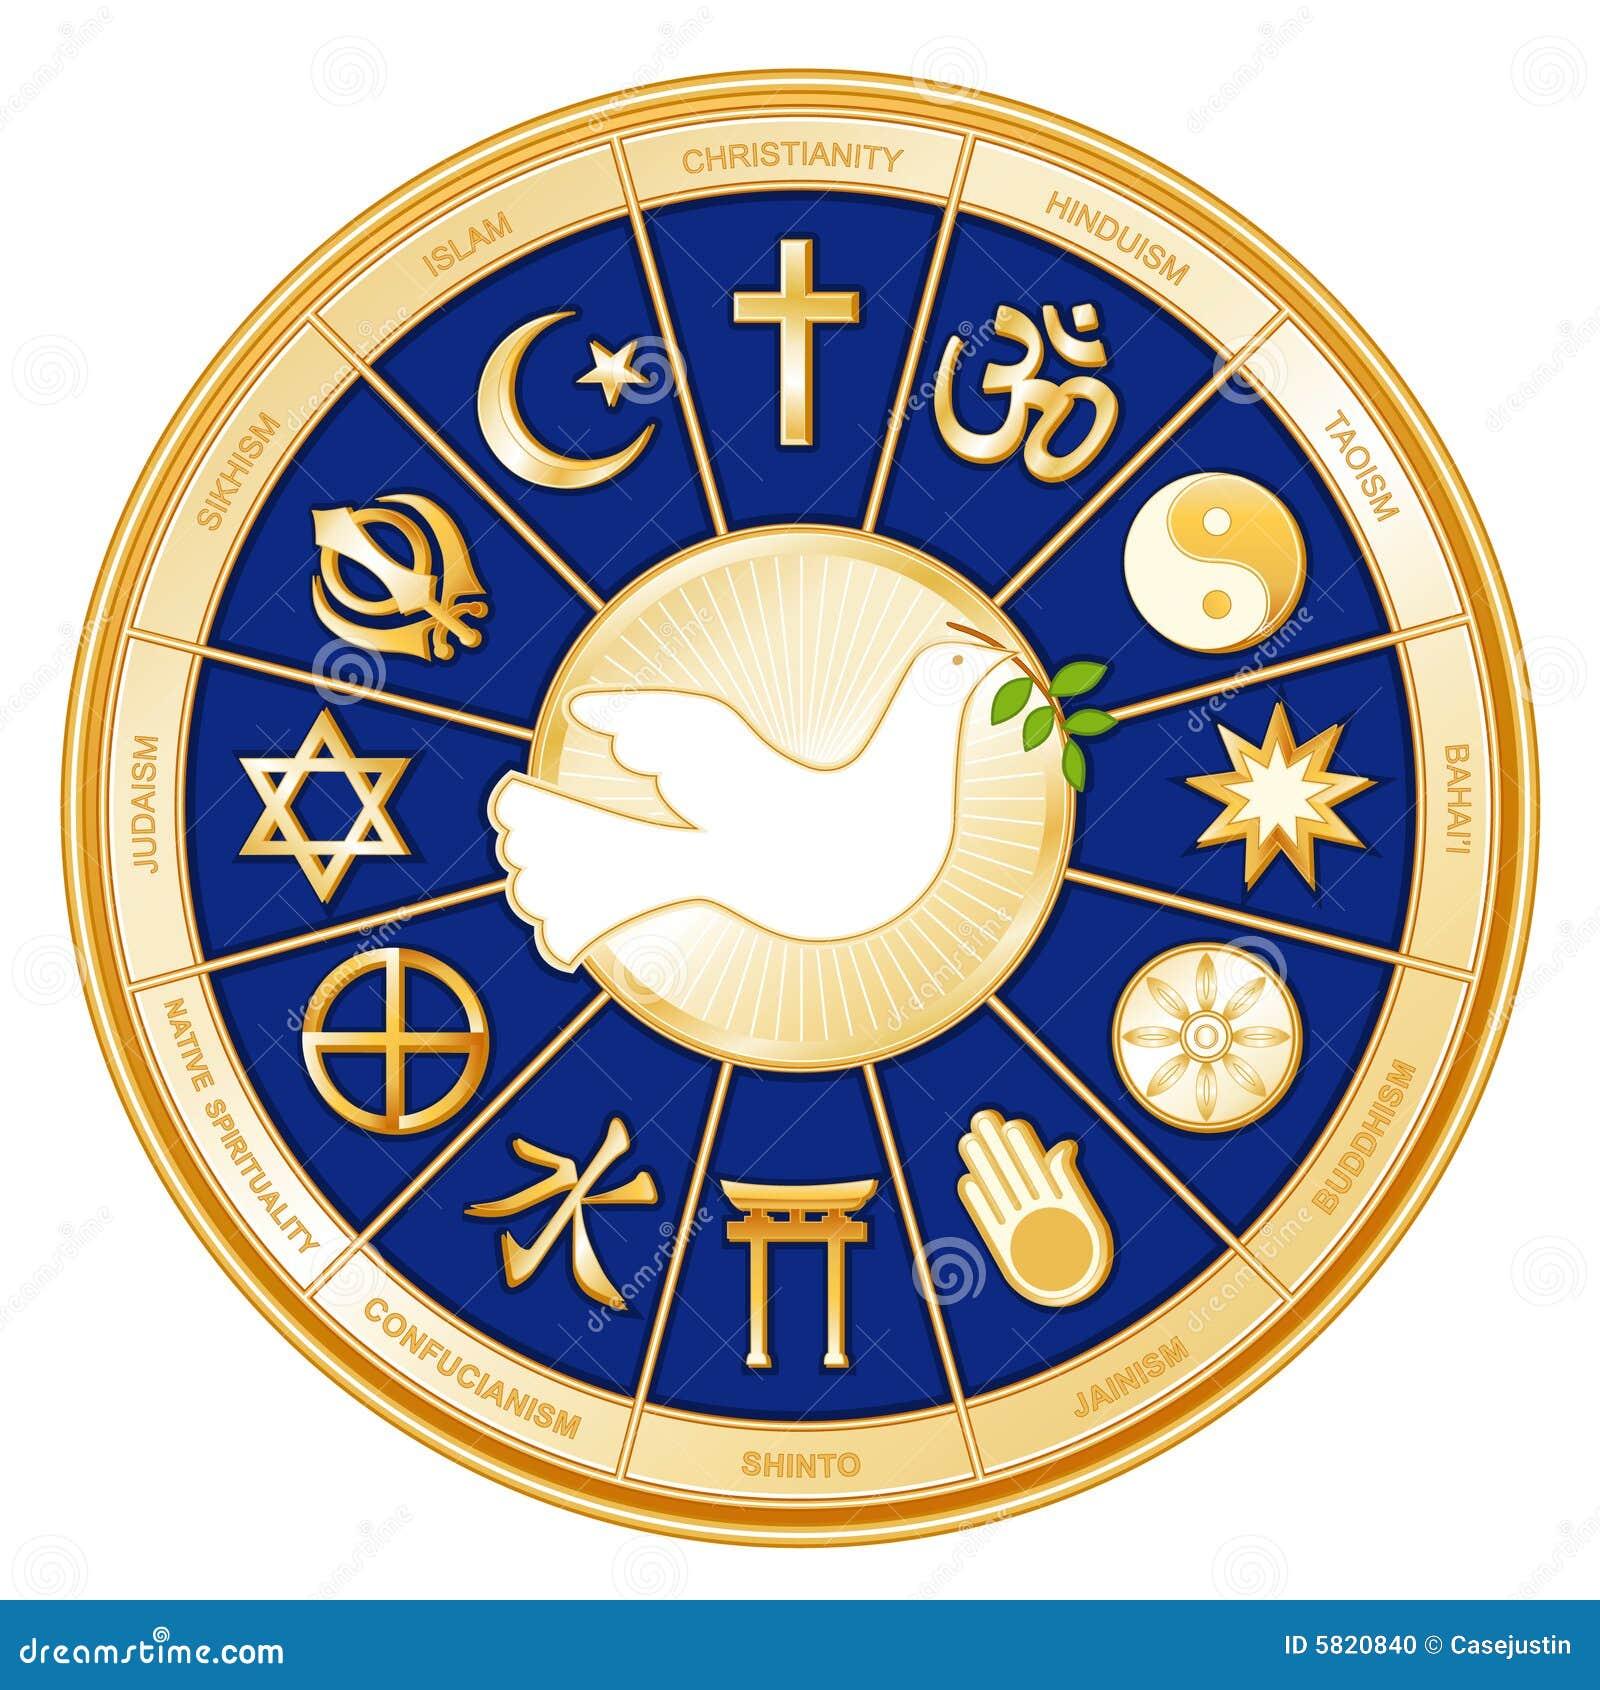 Protestant reformation symbols more information protestant reformation protestant reformation symbols buycottarizona